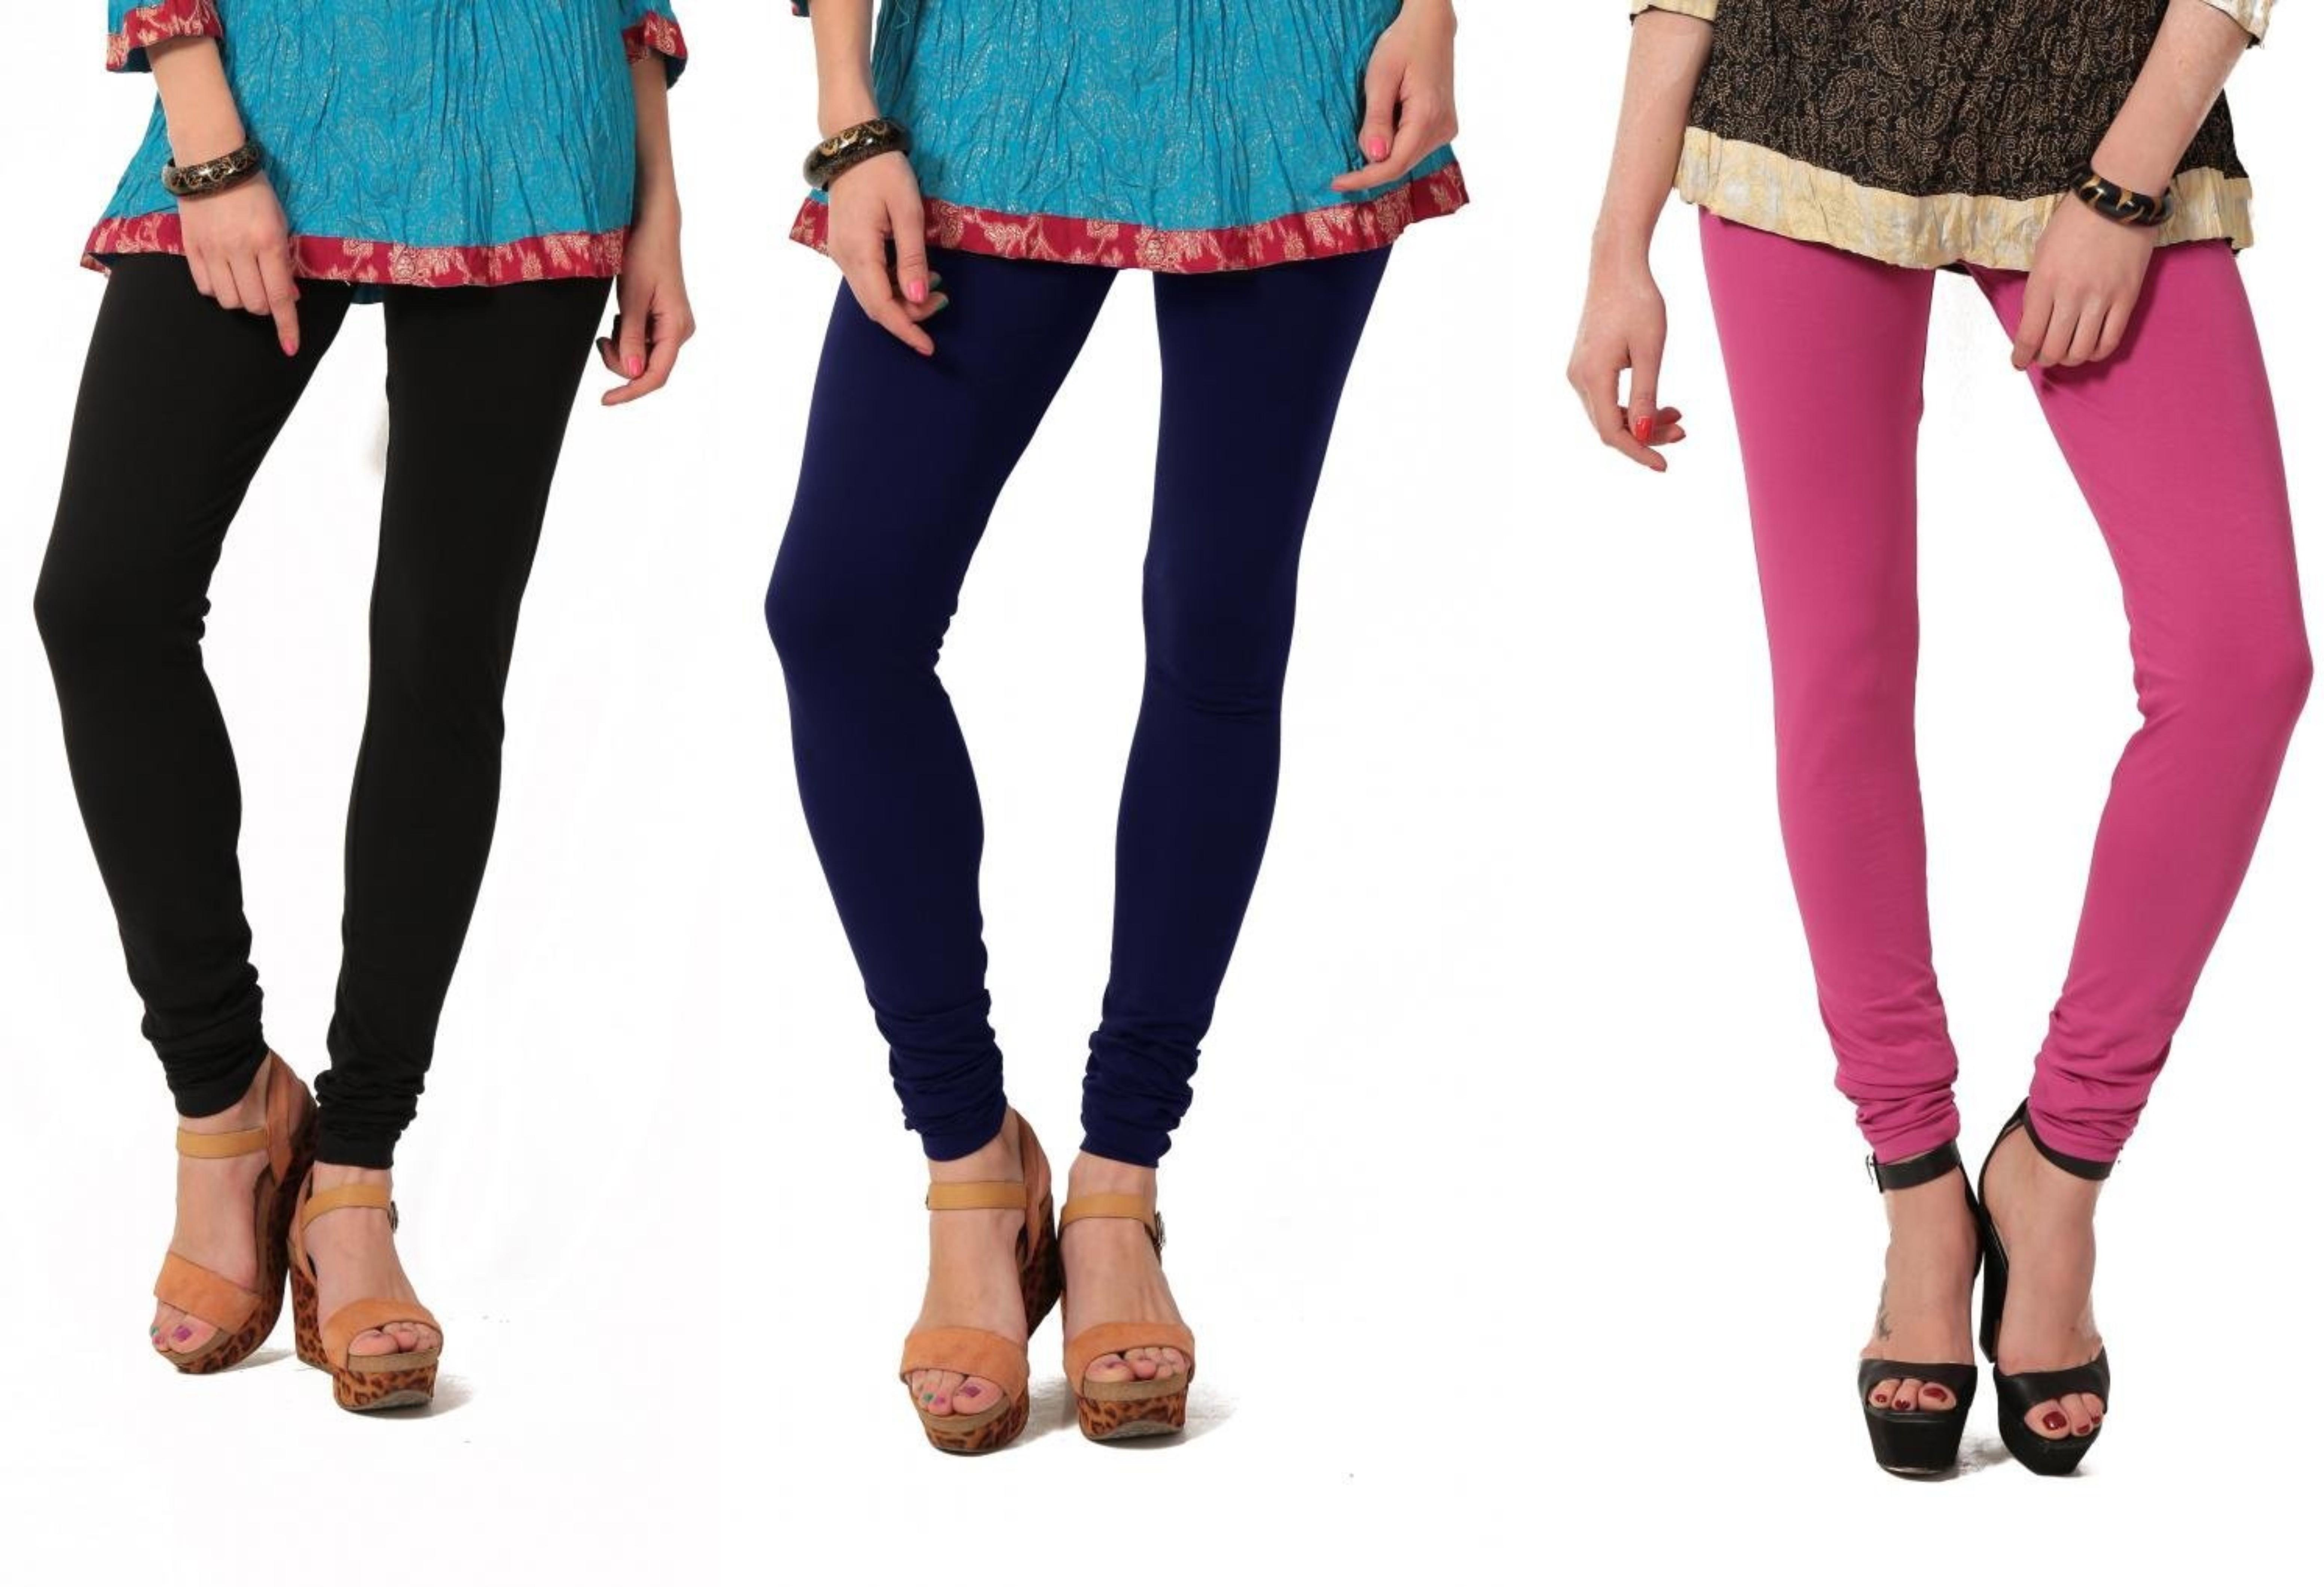 Angel Soft Womens Black, Blue, Pink Leggings(Pack of 3)